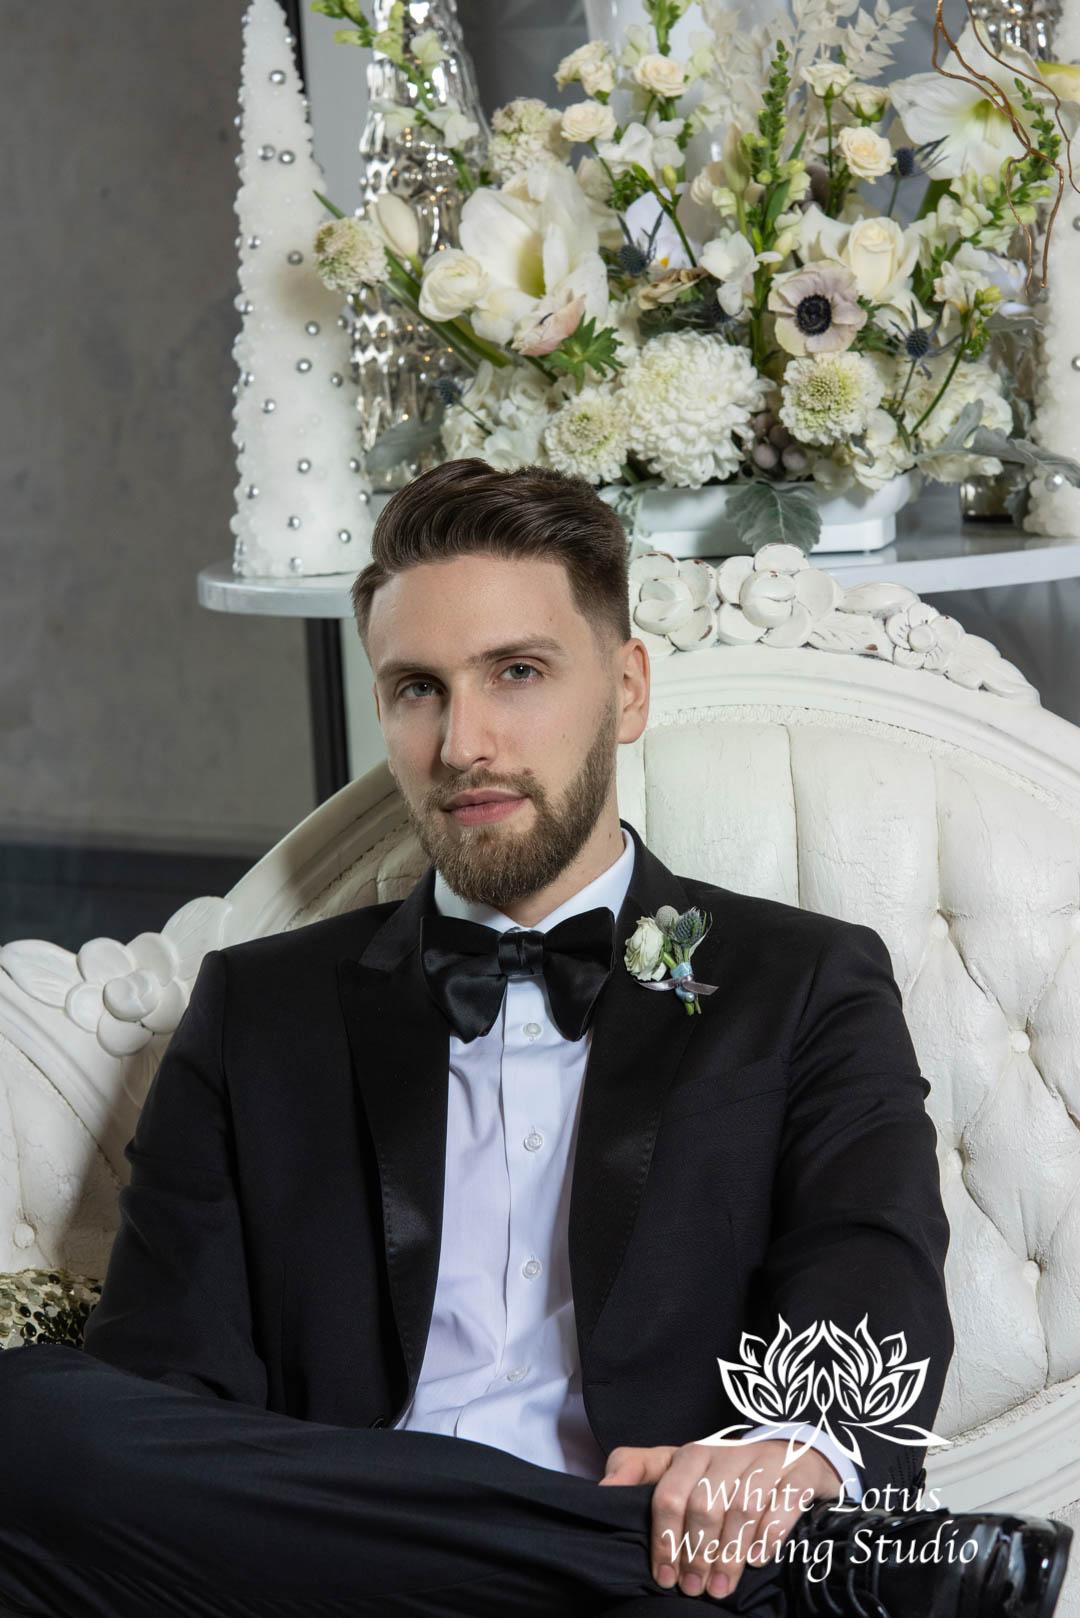 080- GLAM WINTERLUXE WEDDING INSPIRATION